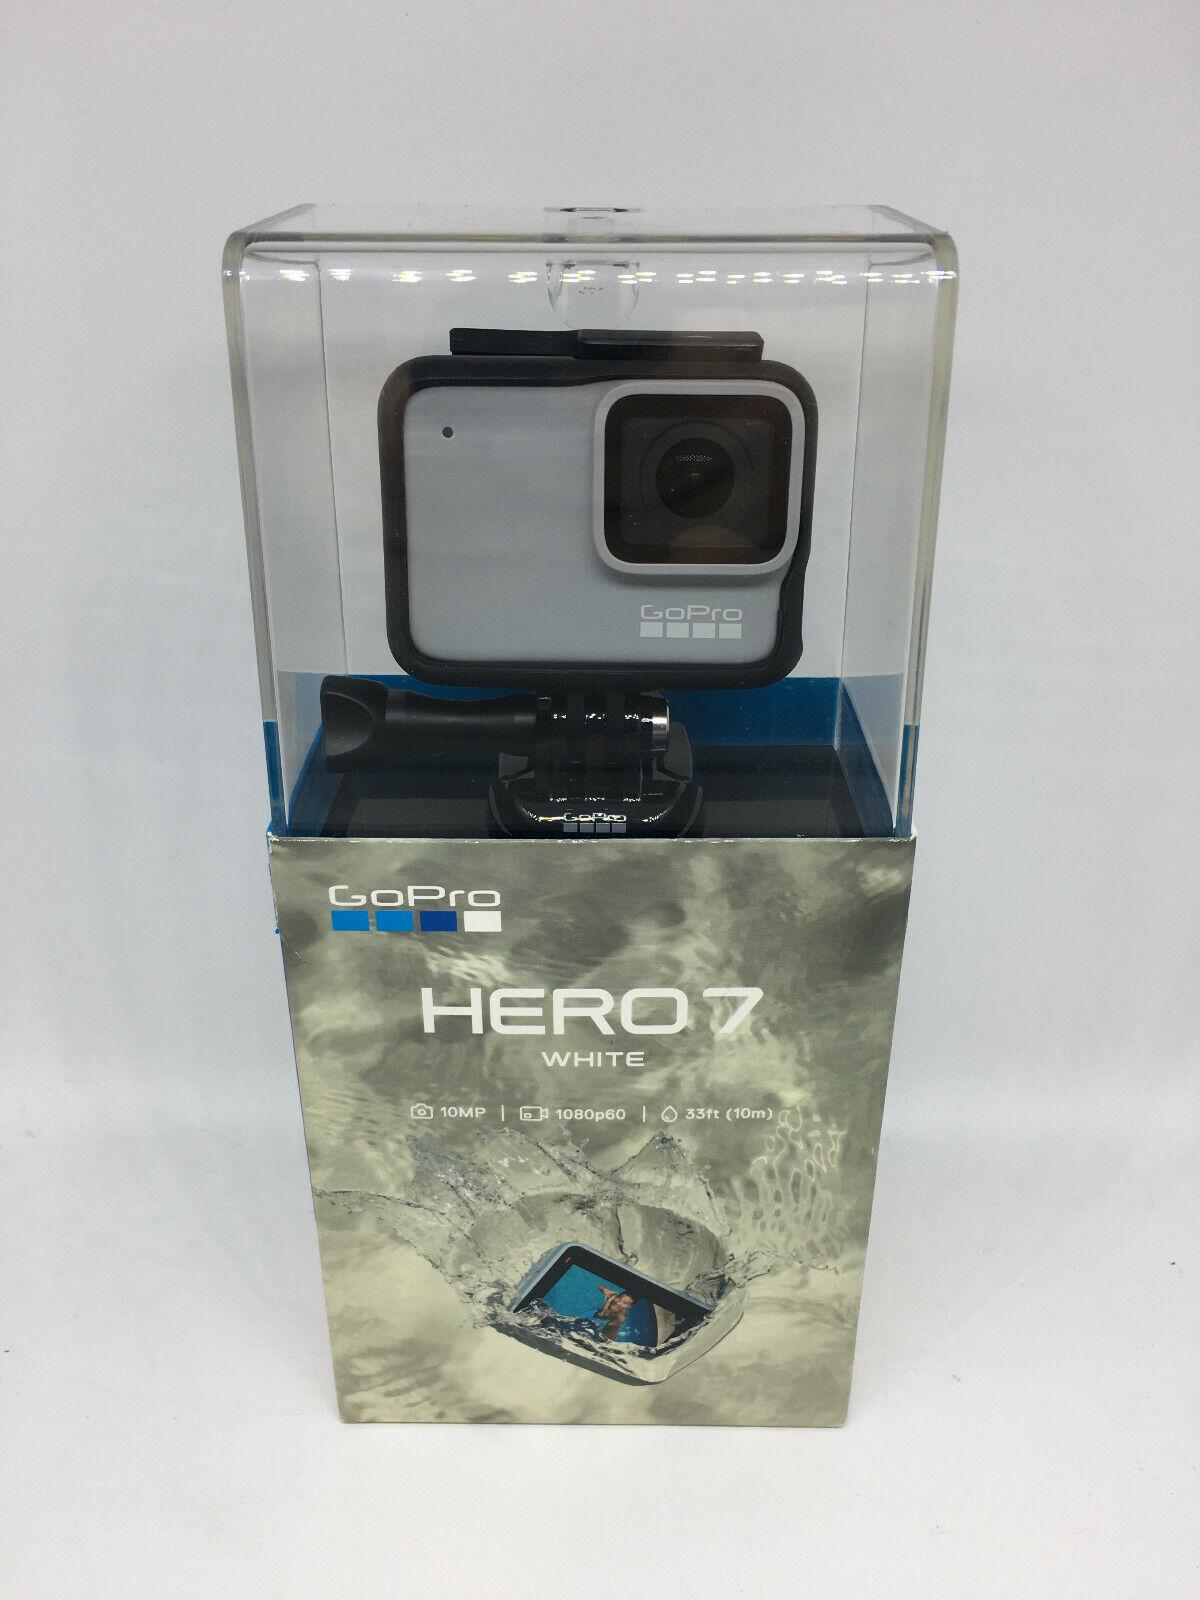 Brand New GoPro HERO7 Waterproof Digital Action Camera - Whi